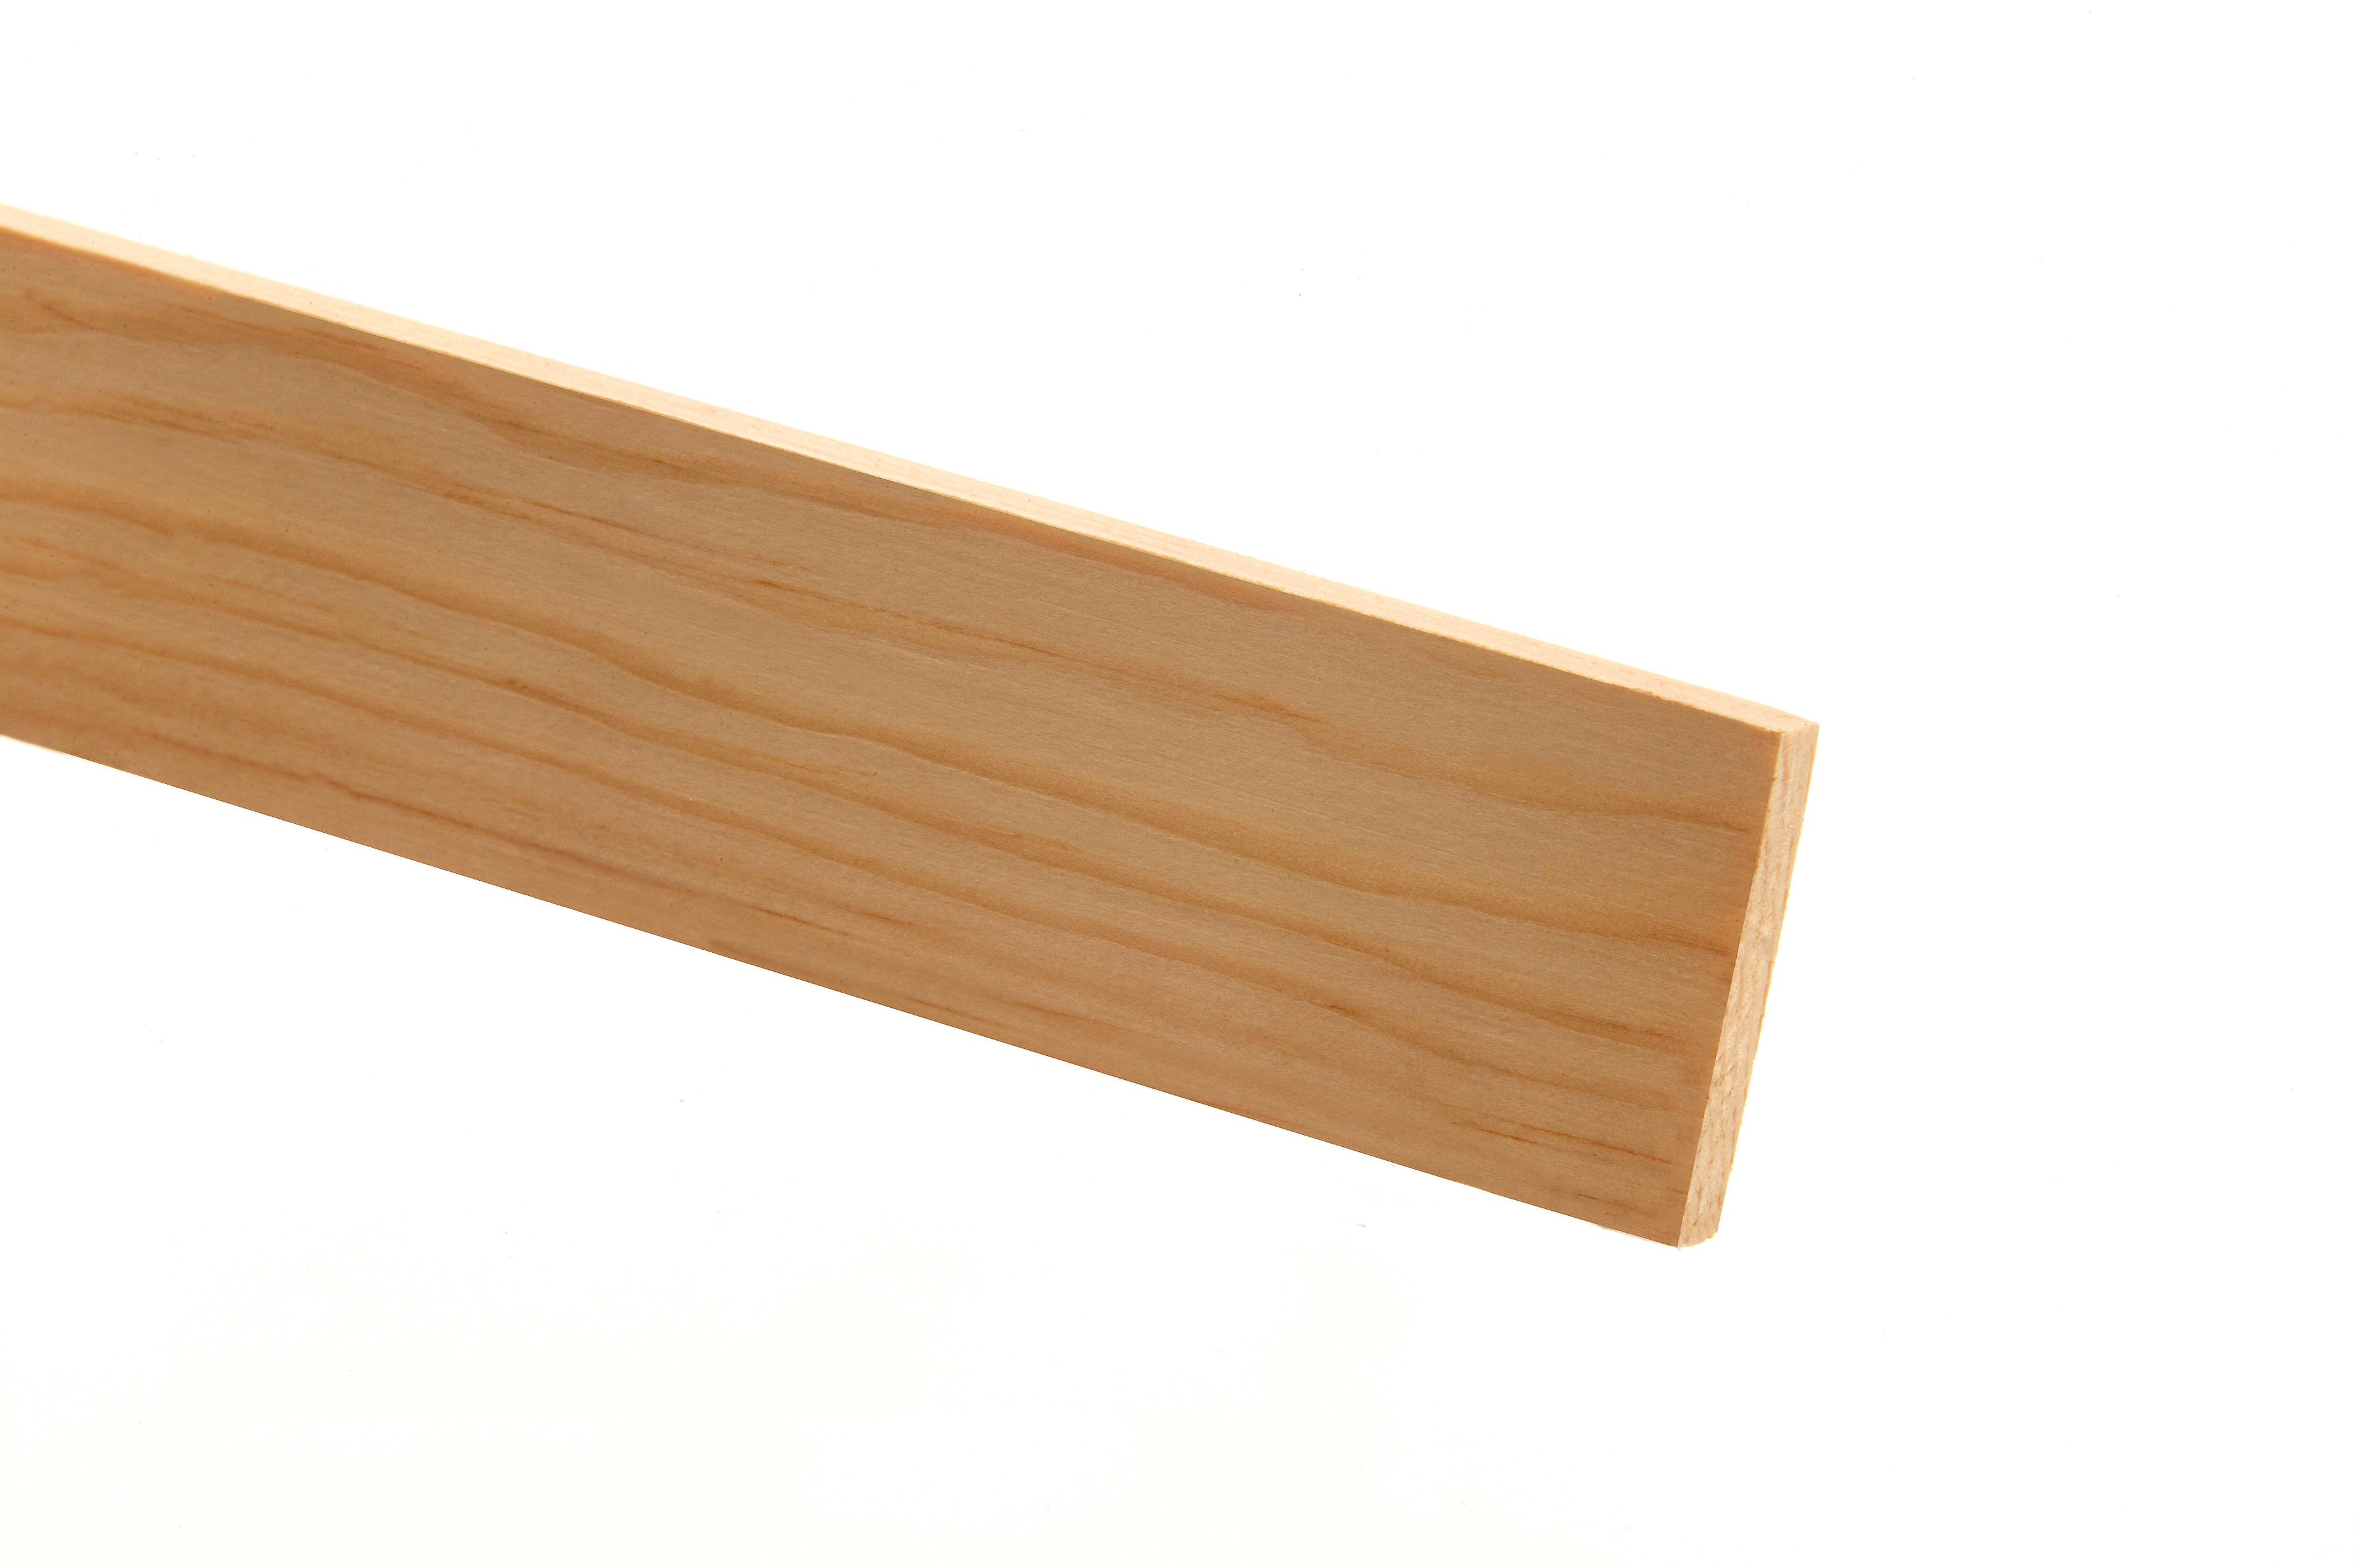 20 Pine PSE Stripwood 4 x 46 x 2400mm